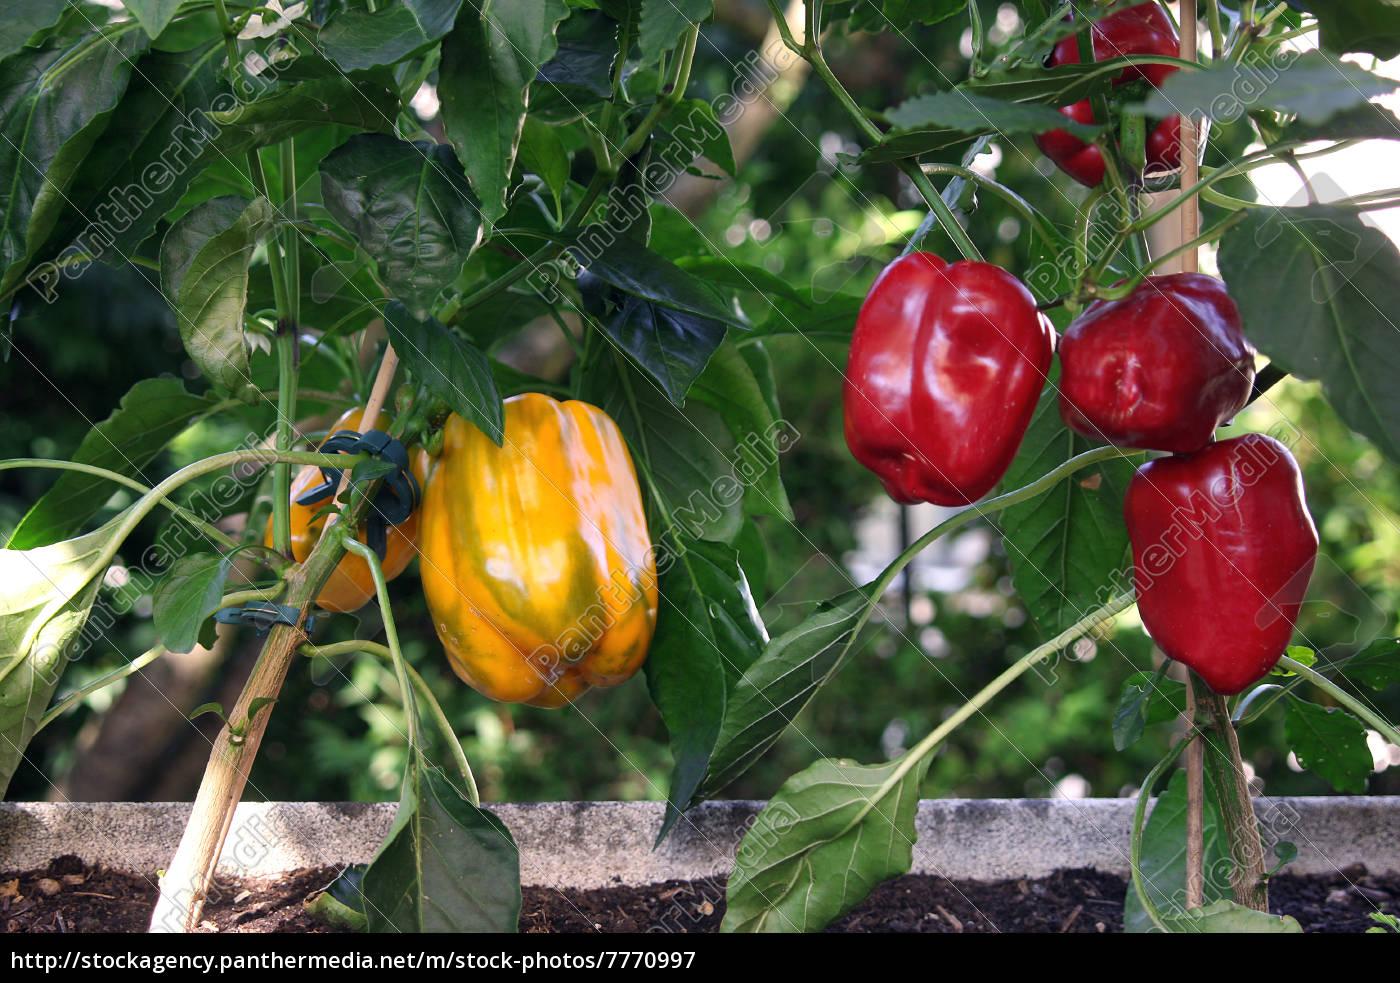 paprikapflanzen - 7770997